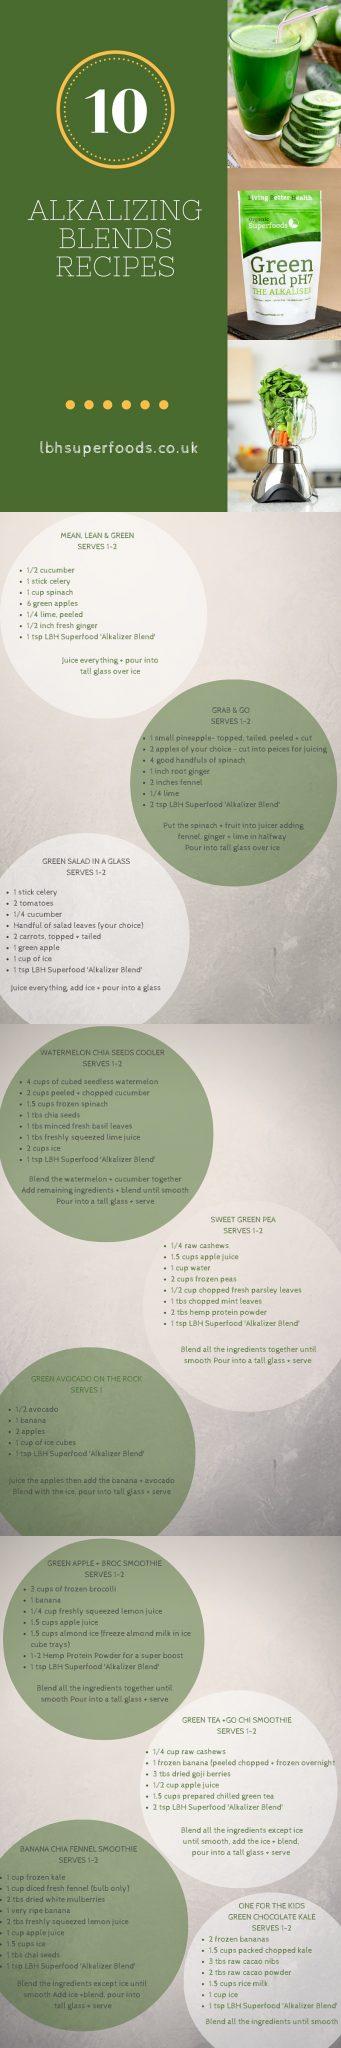 The Alkaliser 10 Recipes one doc